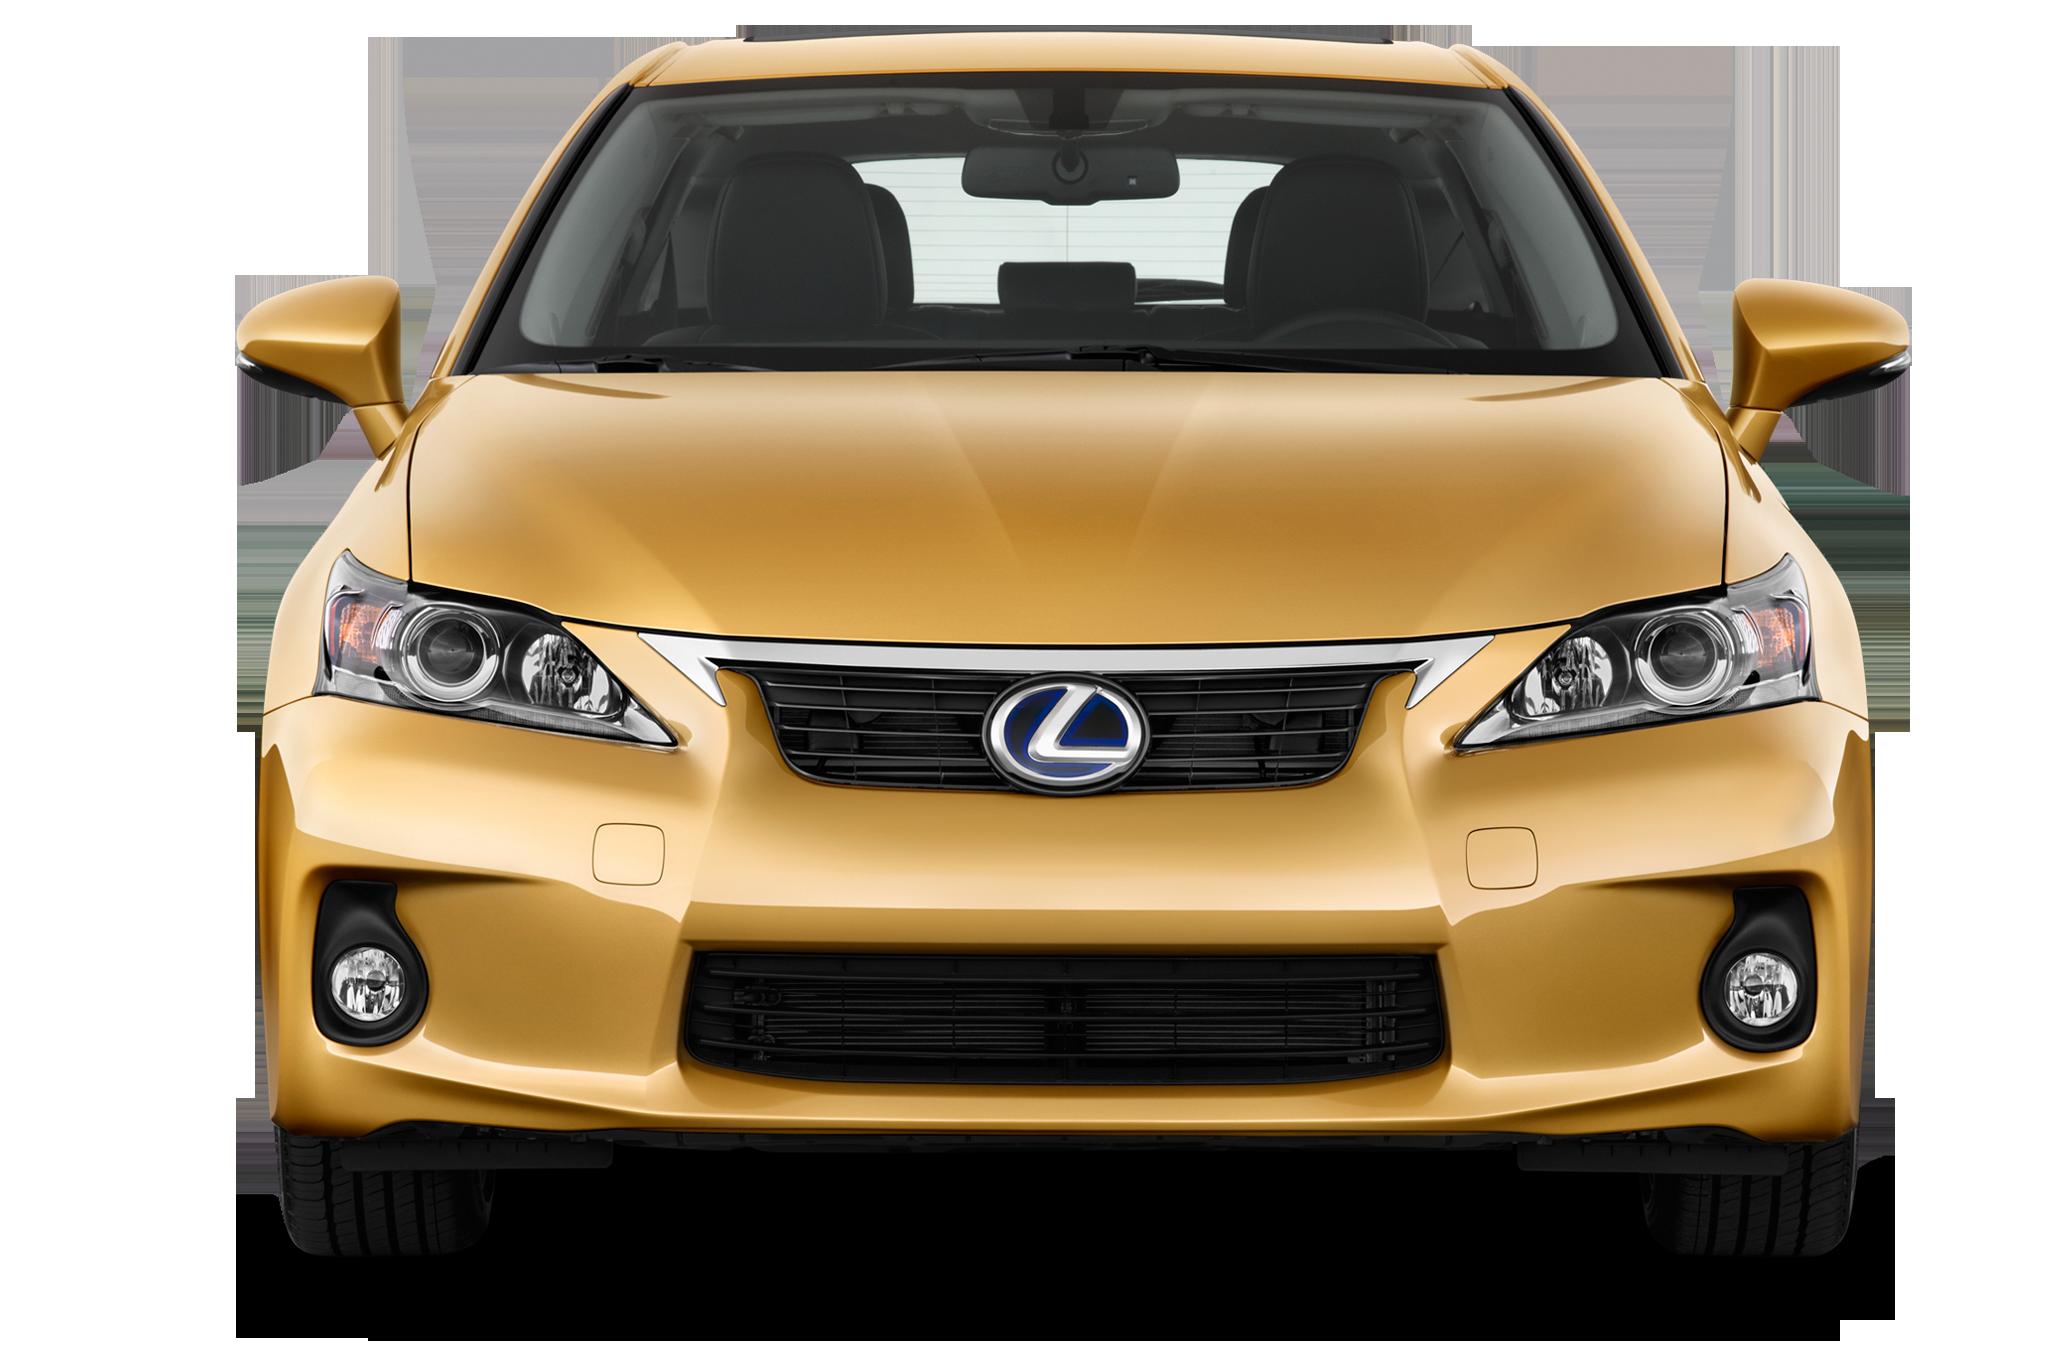 Lexus CT 200h 2013 International Price & Overview